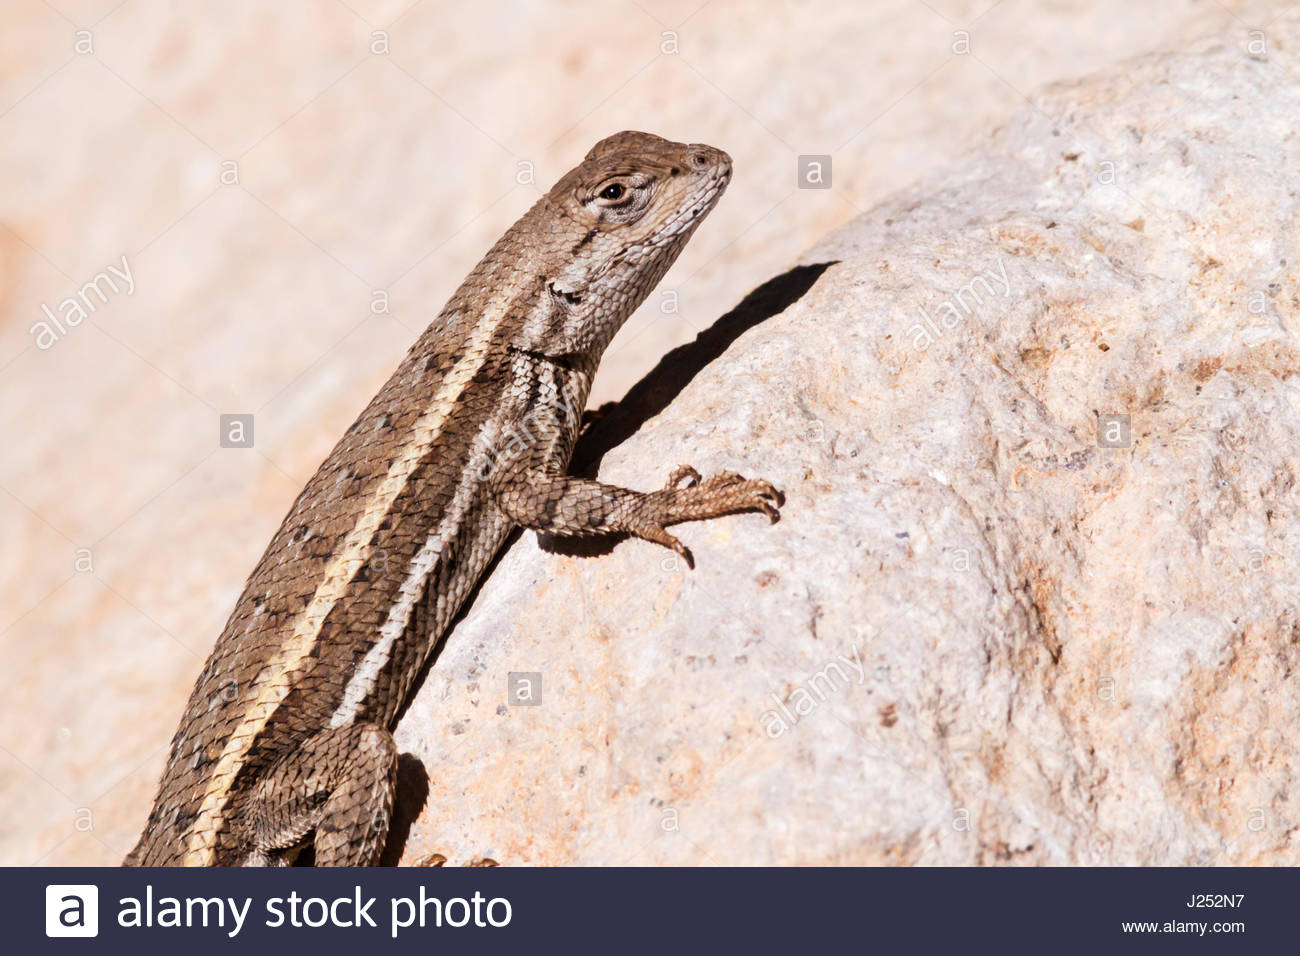 Striped Plateau Lizard, Sceloporus virgatus, on rock in southeastern Arizona Stock Photo